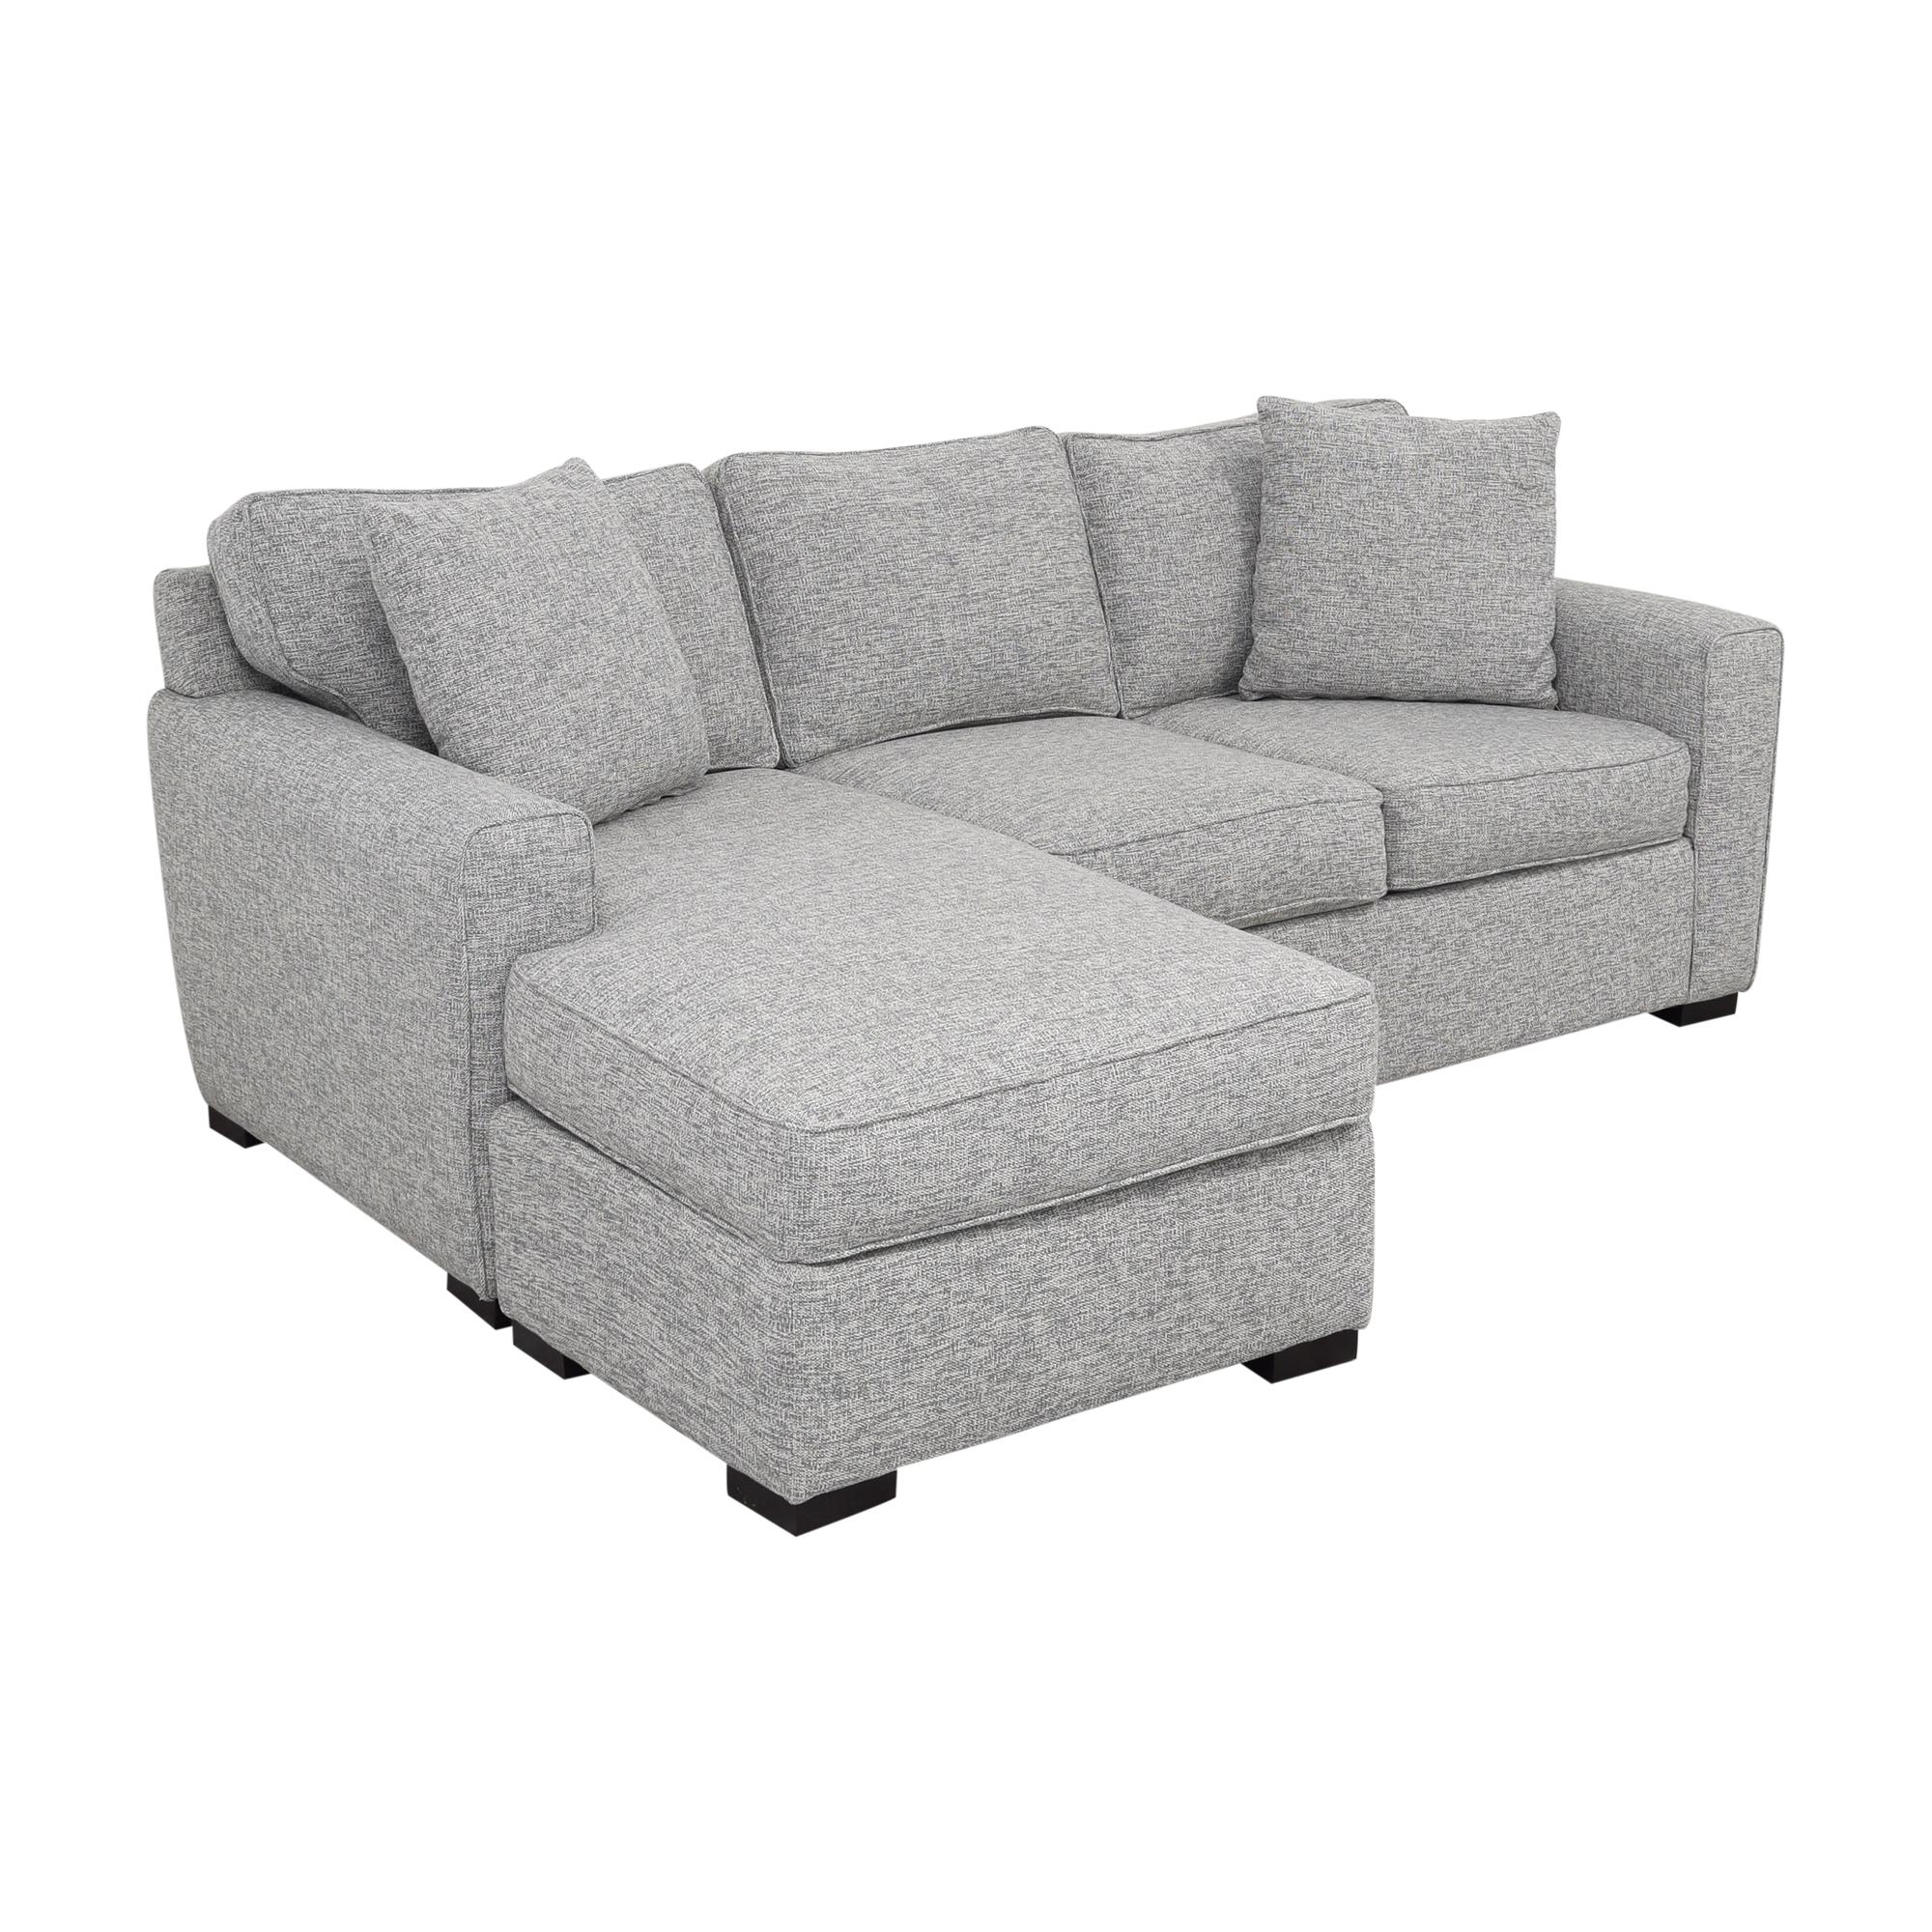 Jonathan Louis Jonathan Louis Callington Sectional Sofa Sofas